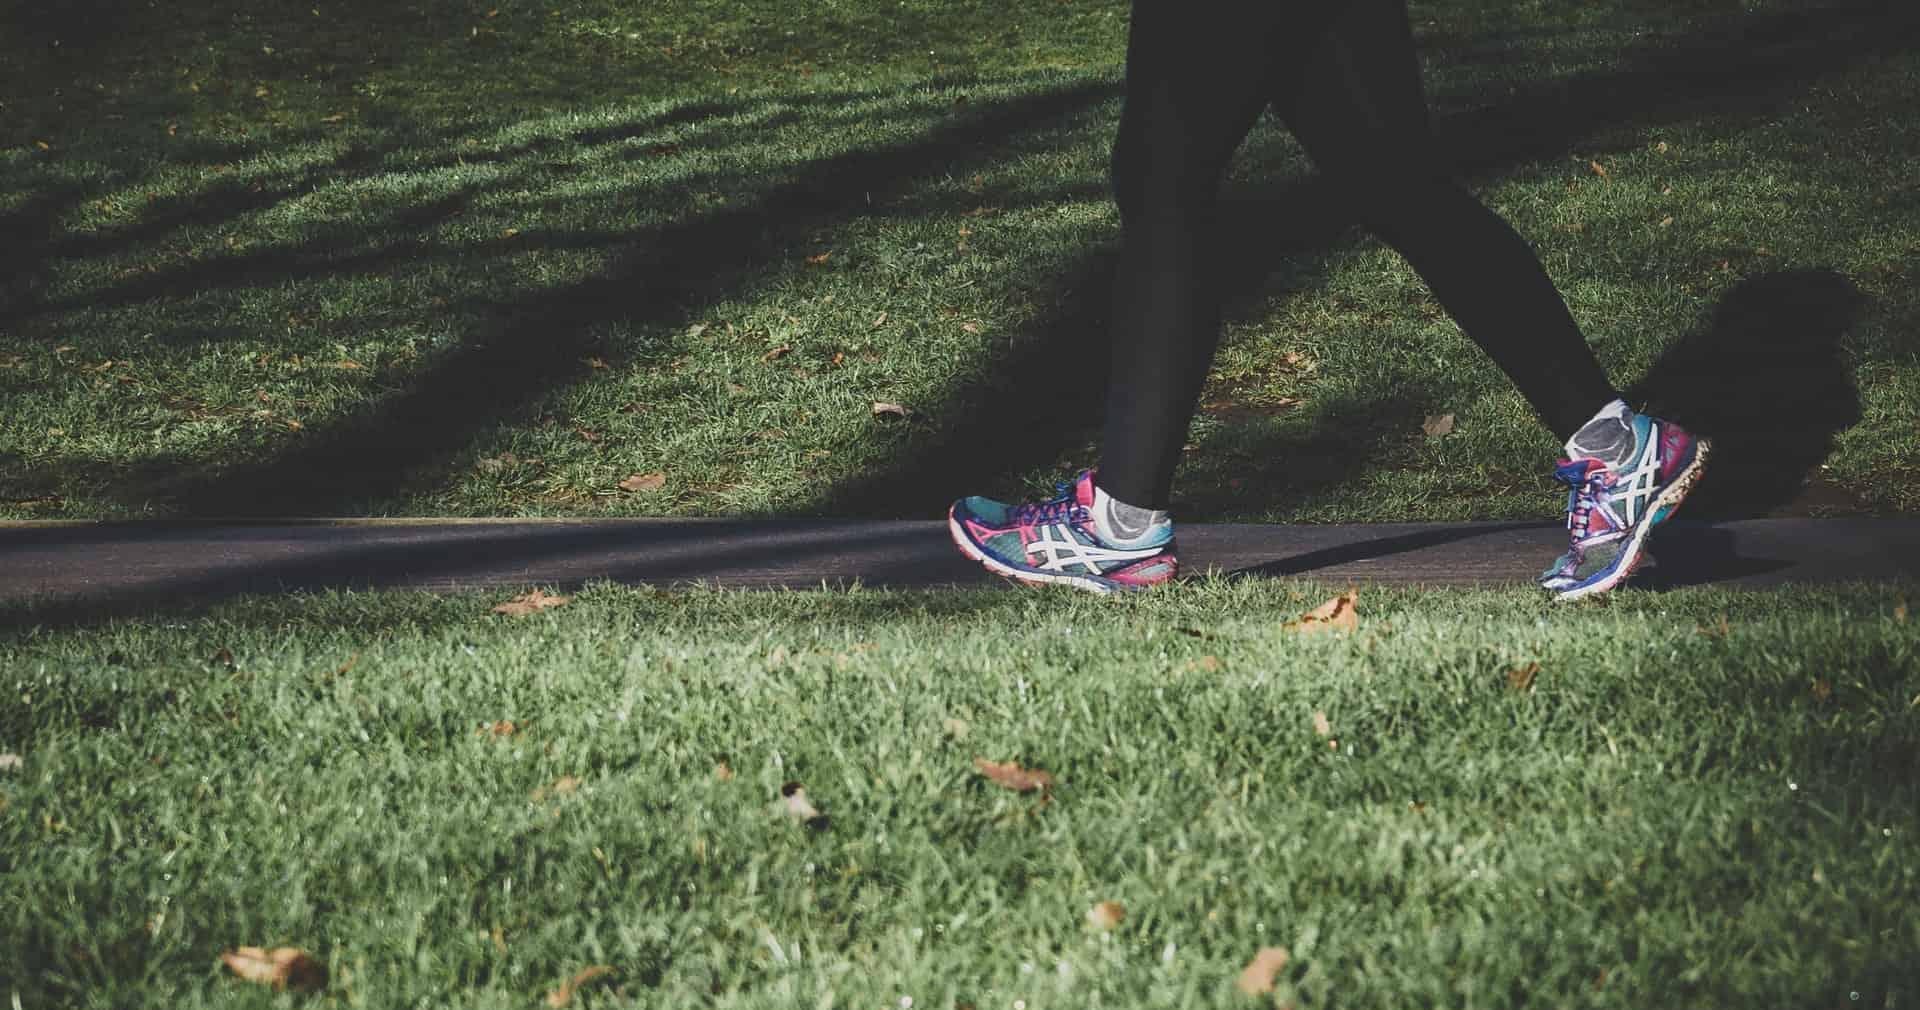 Walk to avoid burnout